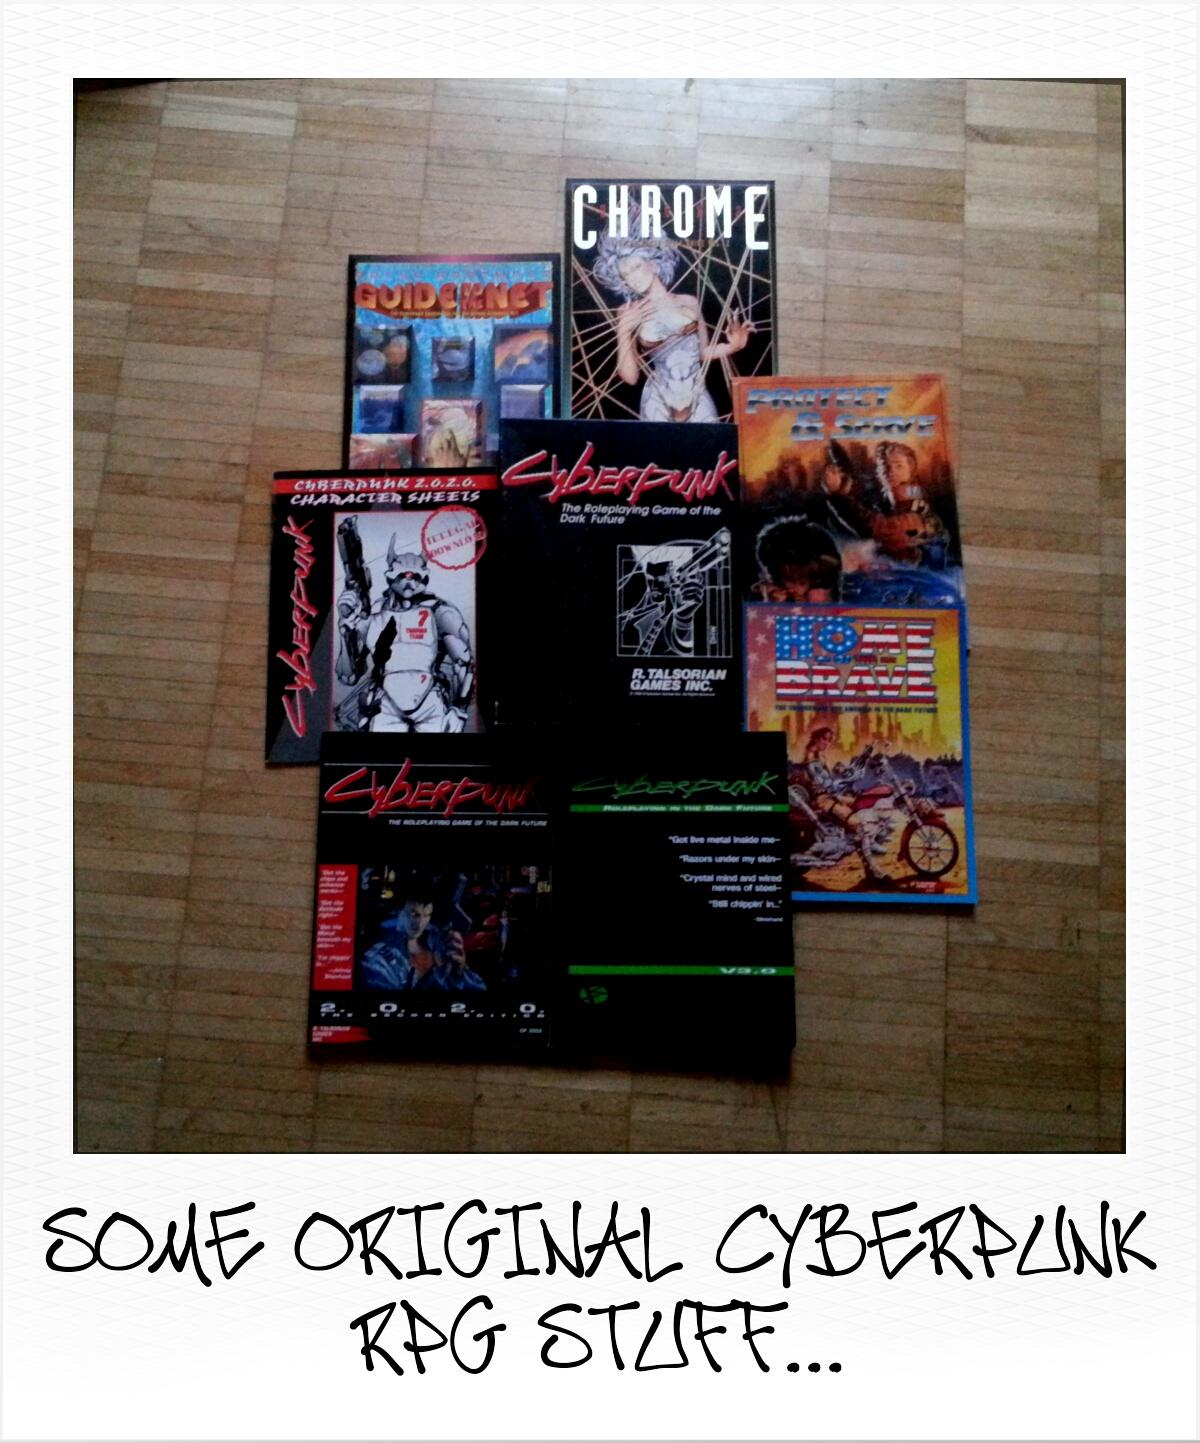 Some original Cyberpunk RPG Books (obskures.de)